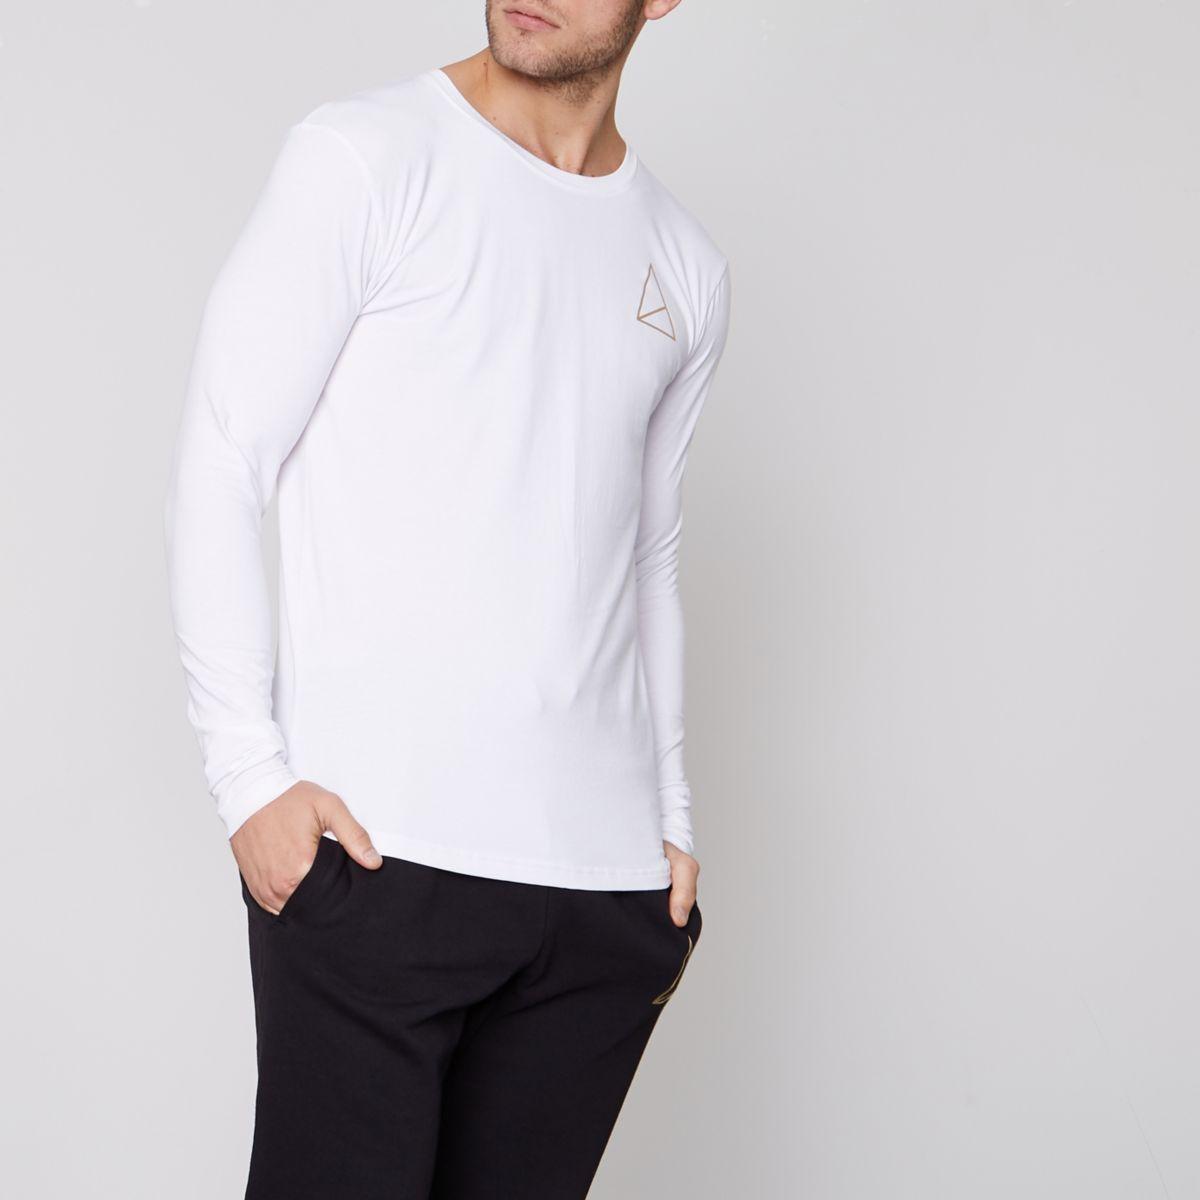 Golden Equation white long sleeve T-shirt